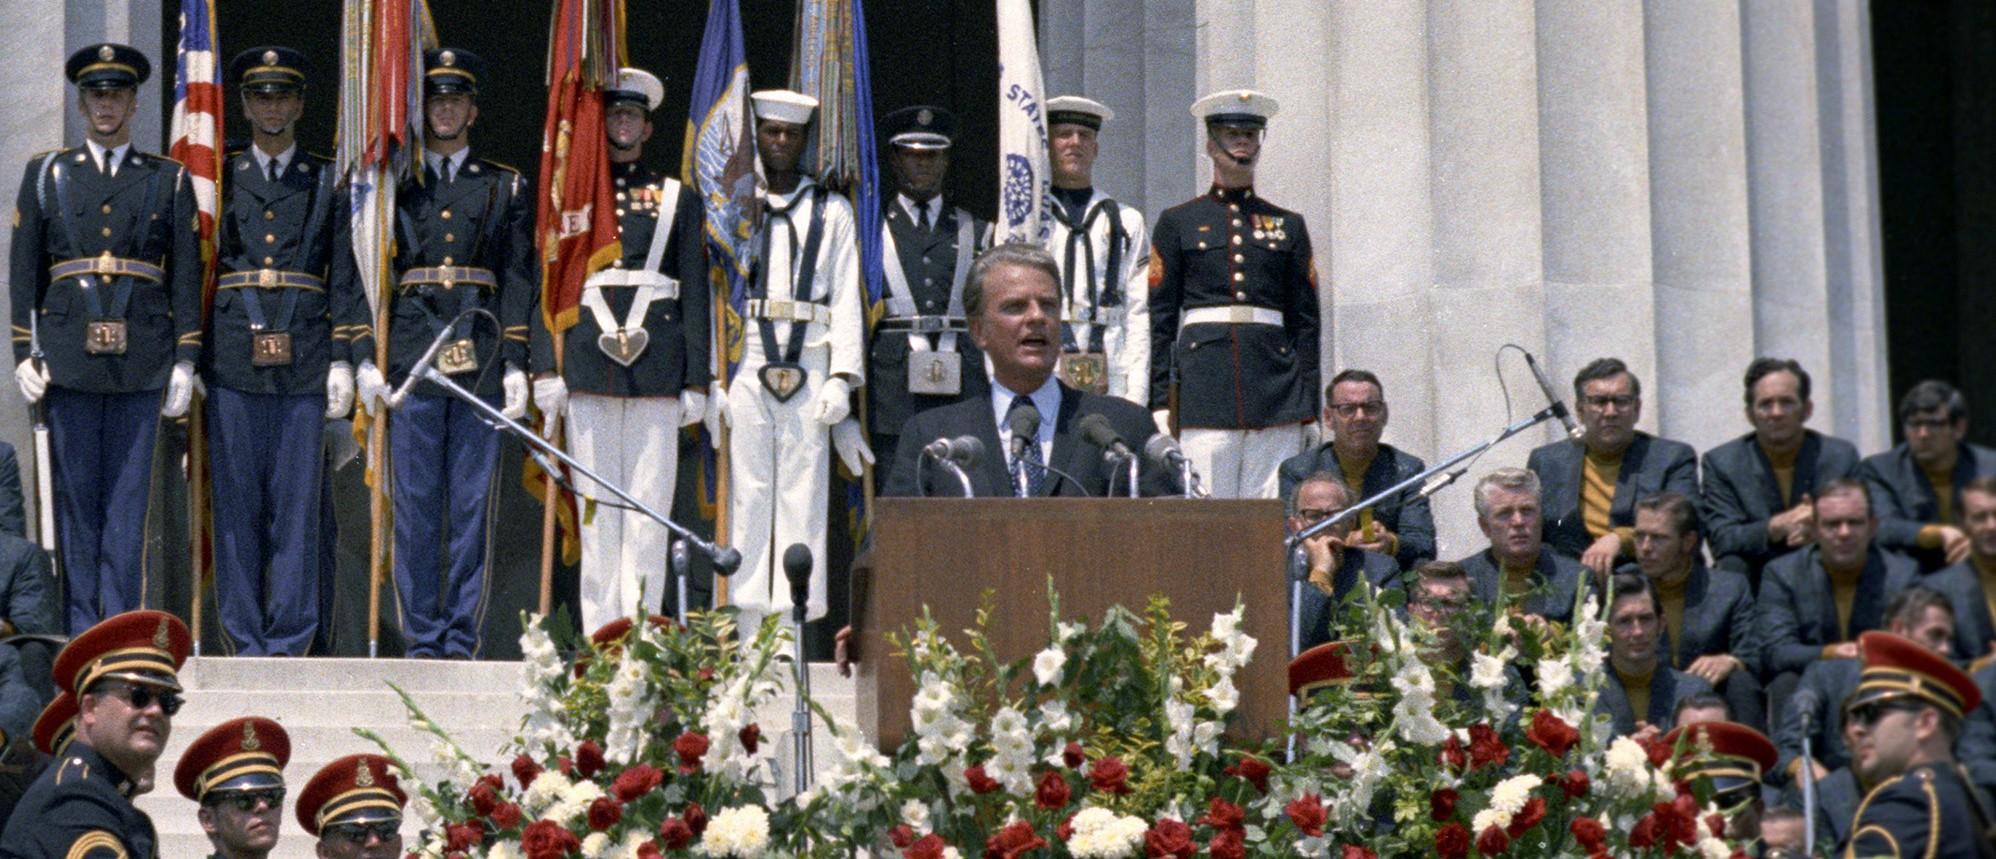 1970 Honor America Day